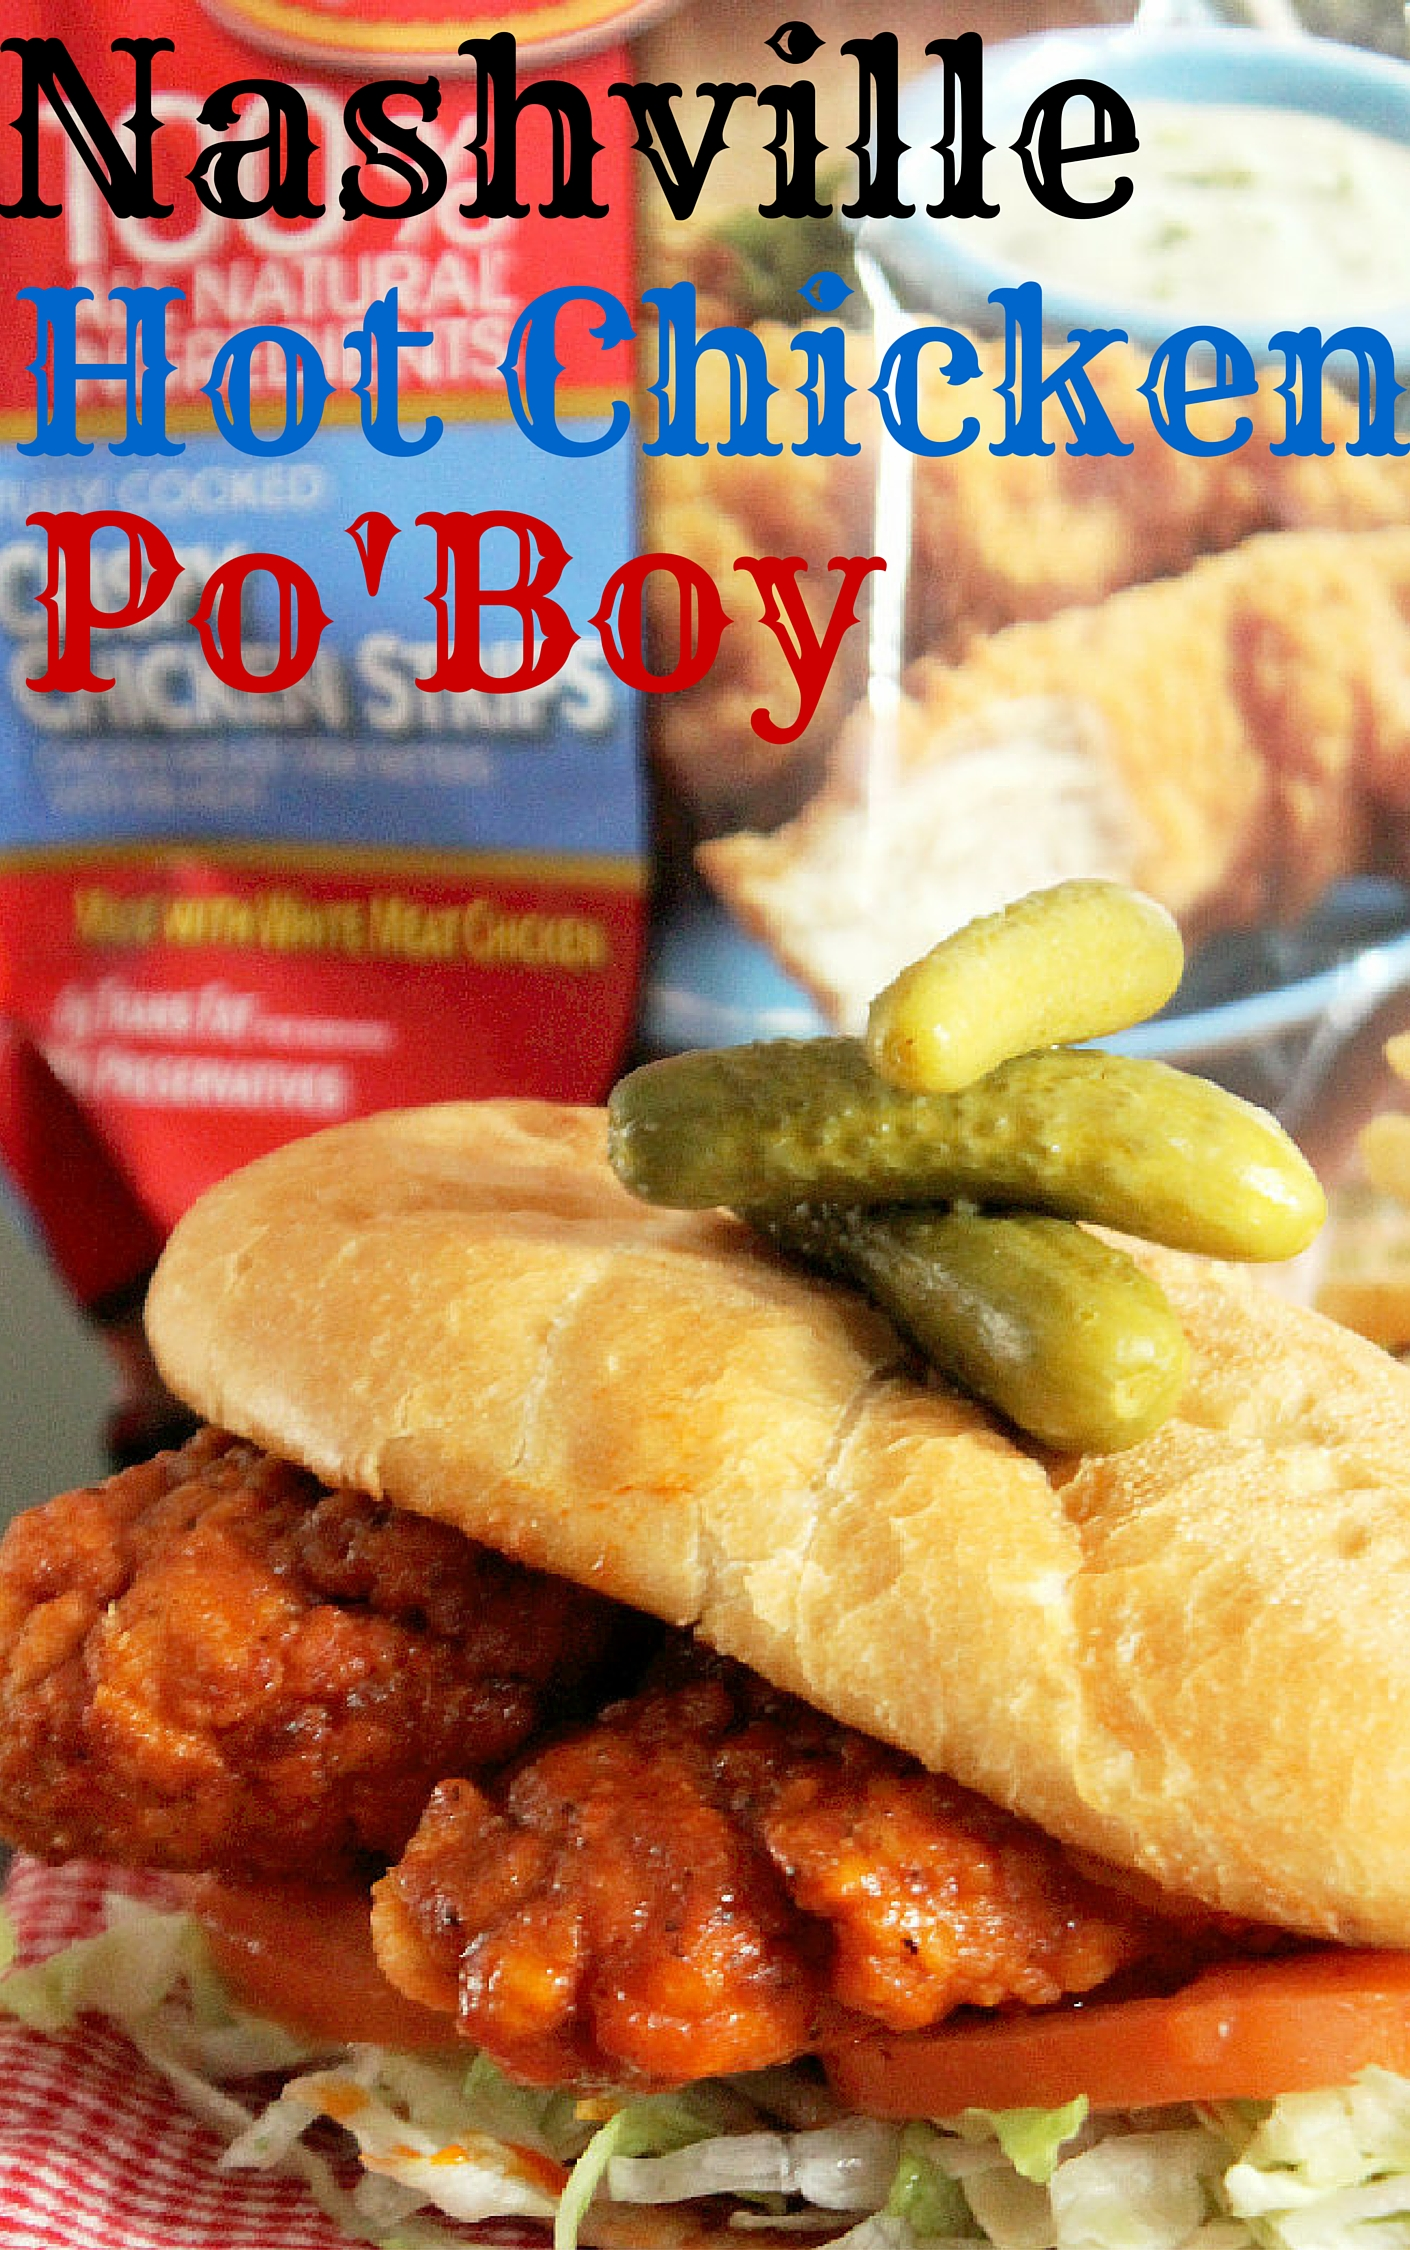 Nashville Hot Chicken Po Boy-Creole Contessa